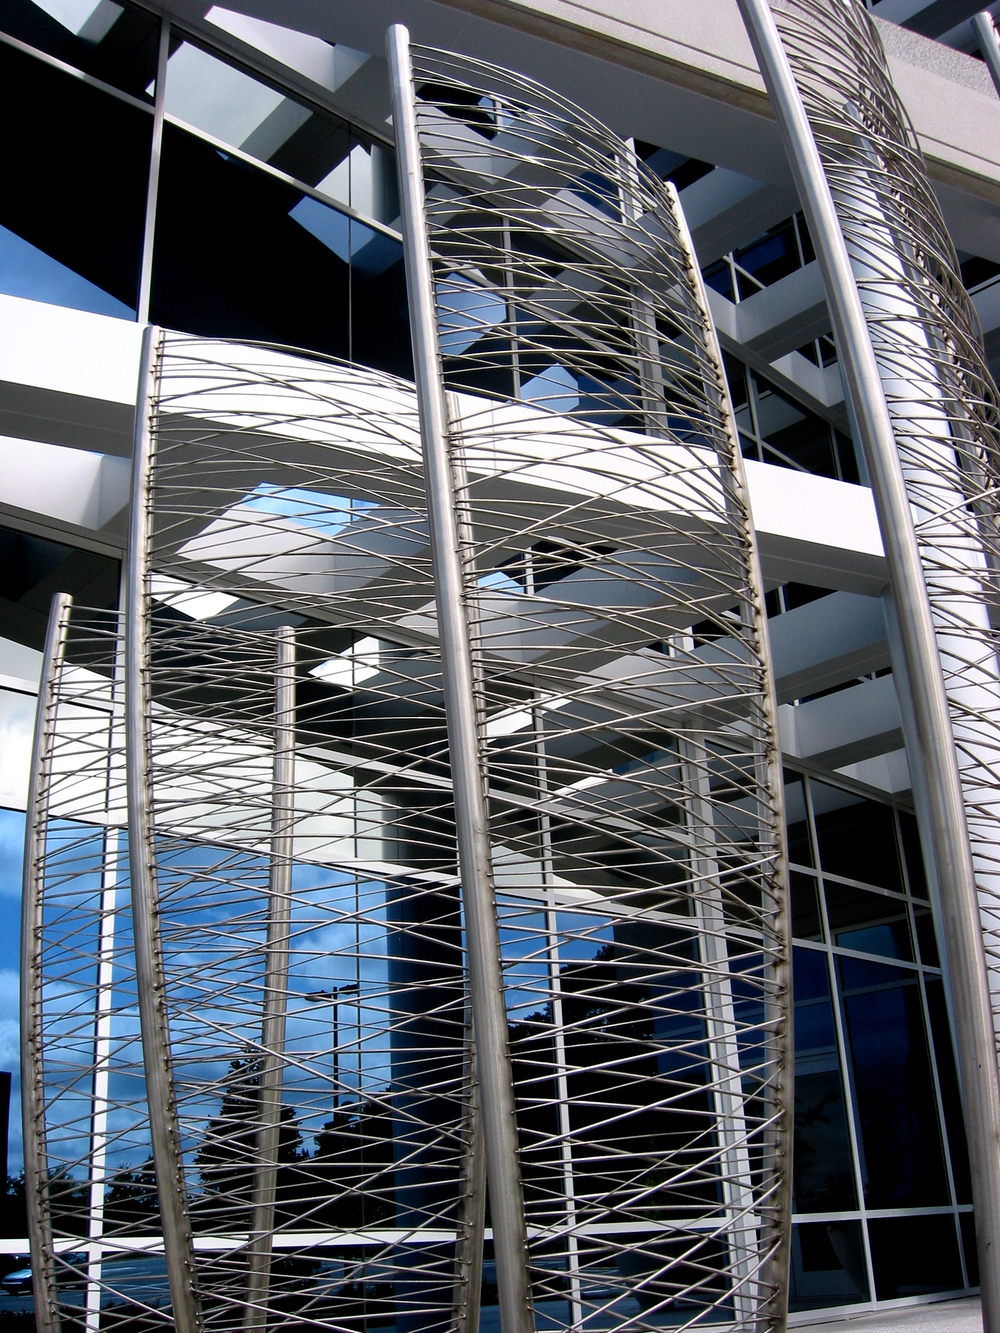 DanburySculpture-04.JPG